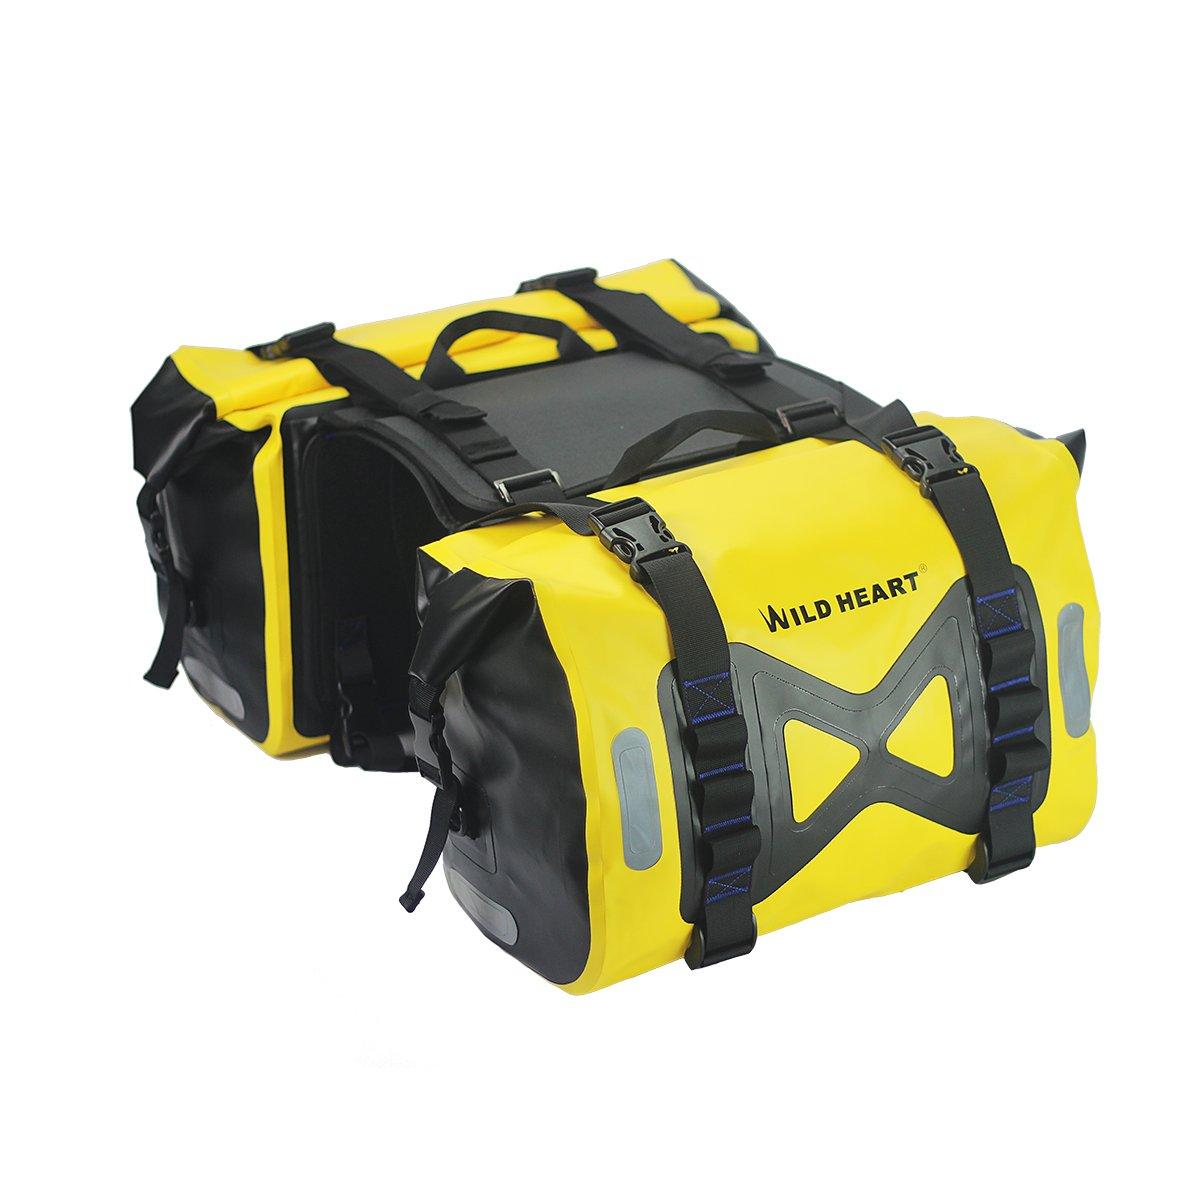 WILD HEART Waterproof bag Motorcycle saddlebag 50L Tank bag Motor Side bag (Yellow)